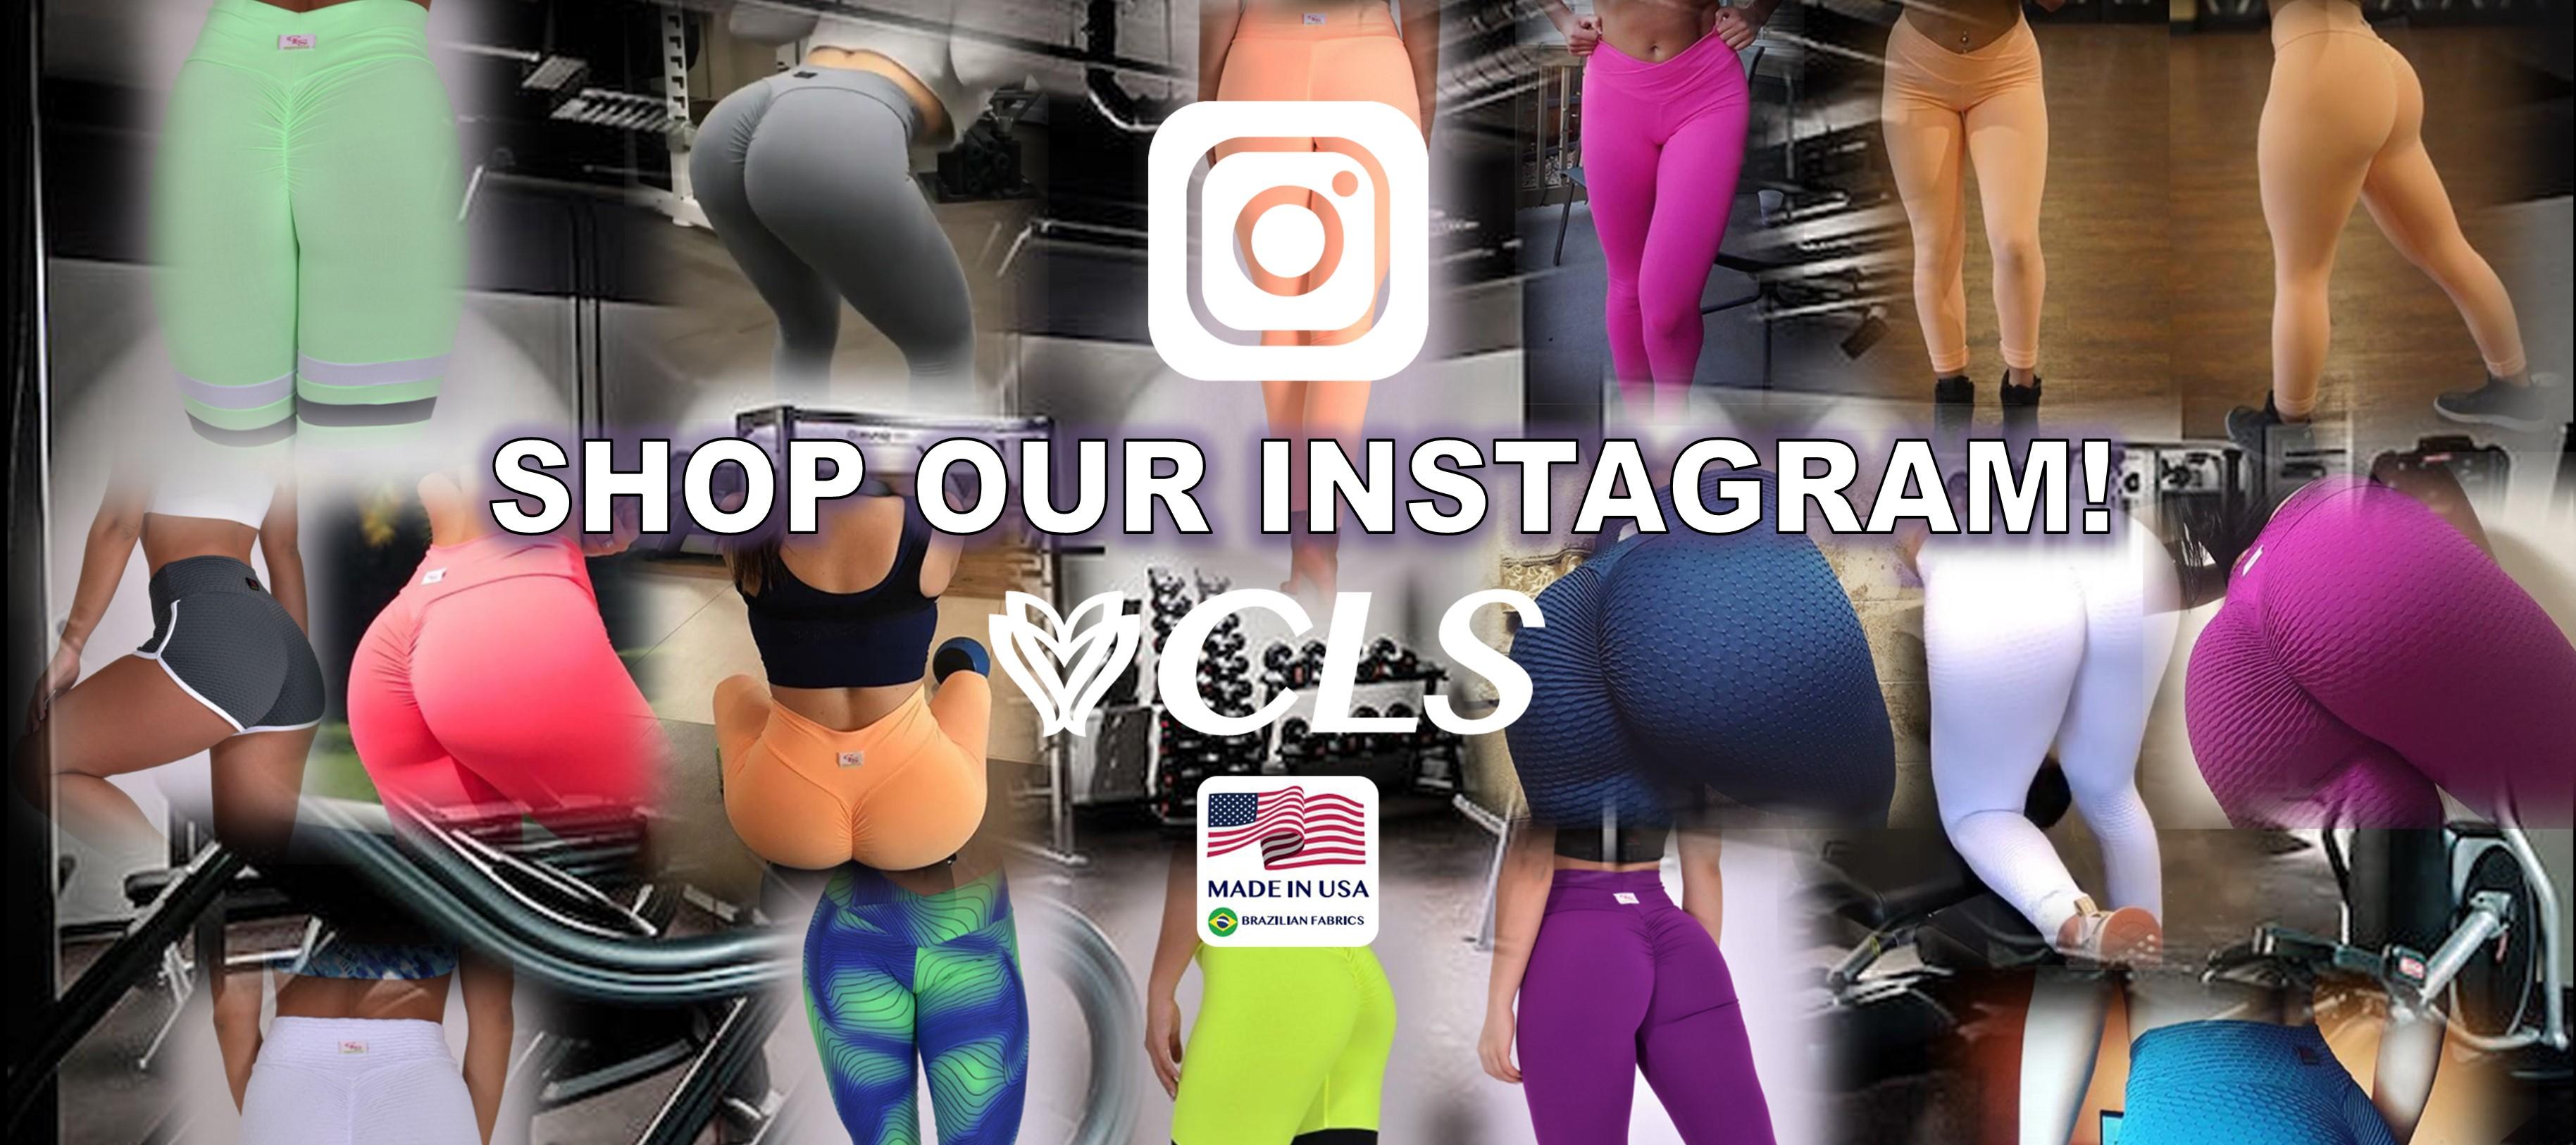 https://www.clssportswear.com/wp-content/uploads/2020/05/Shop-our-Instagram-Banner1.jpg